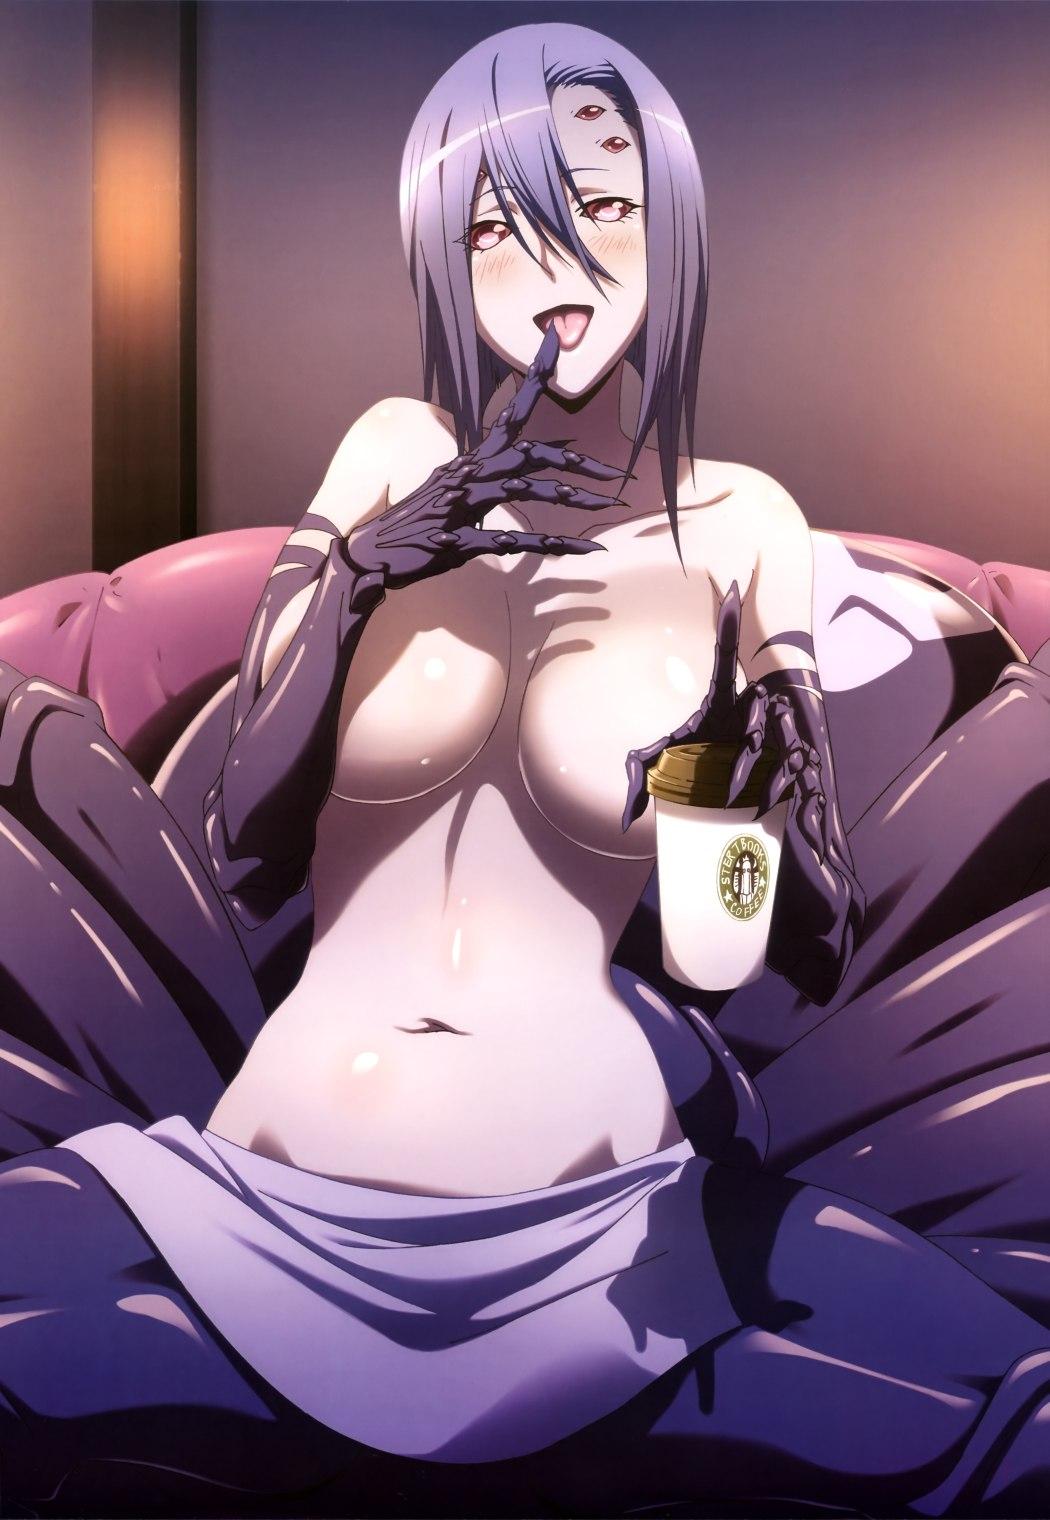 NyanType-Magazine-October-anime-posters-monster musume no iru nichijou